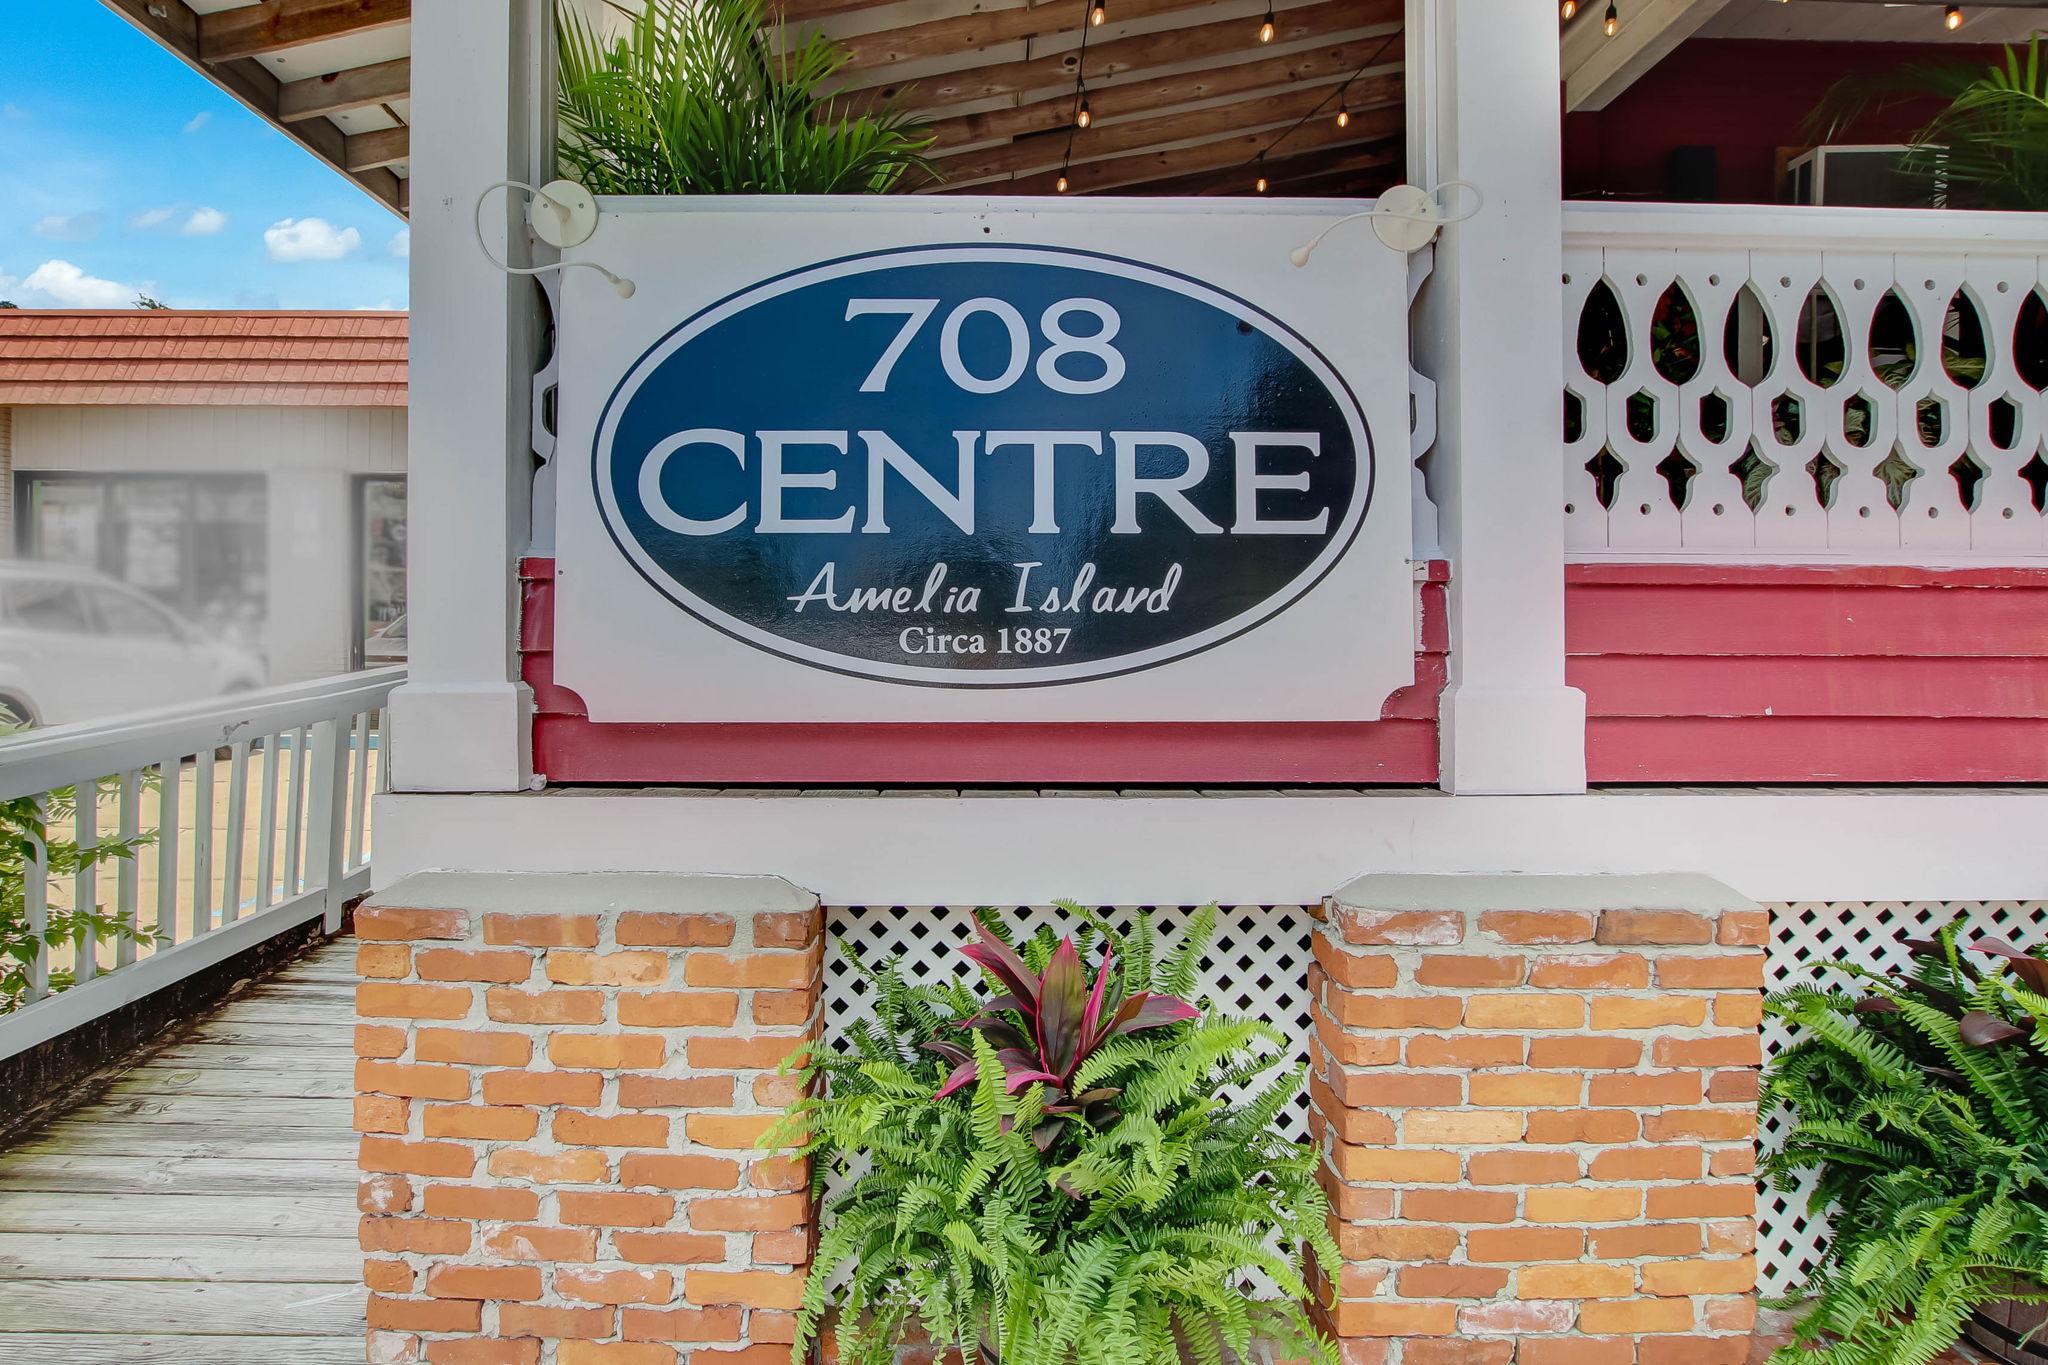 708 Centre Street